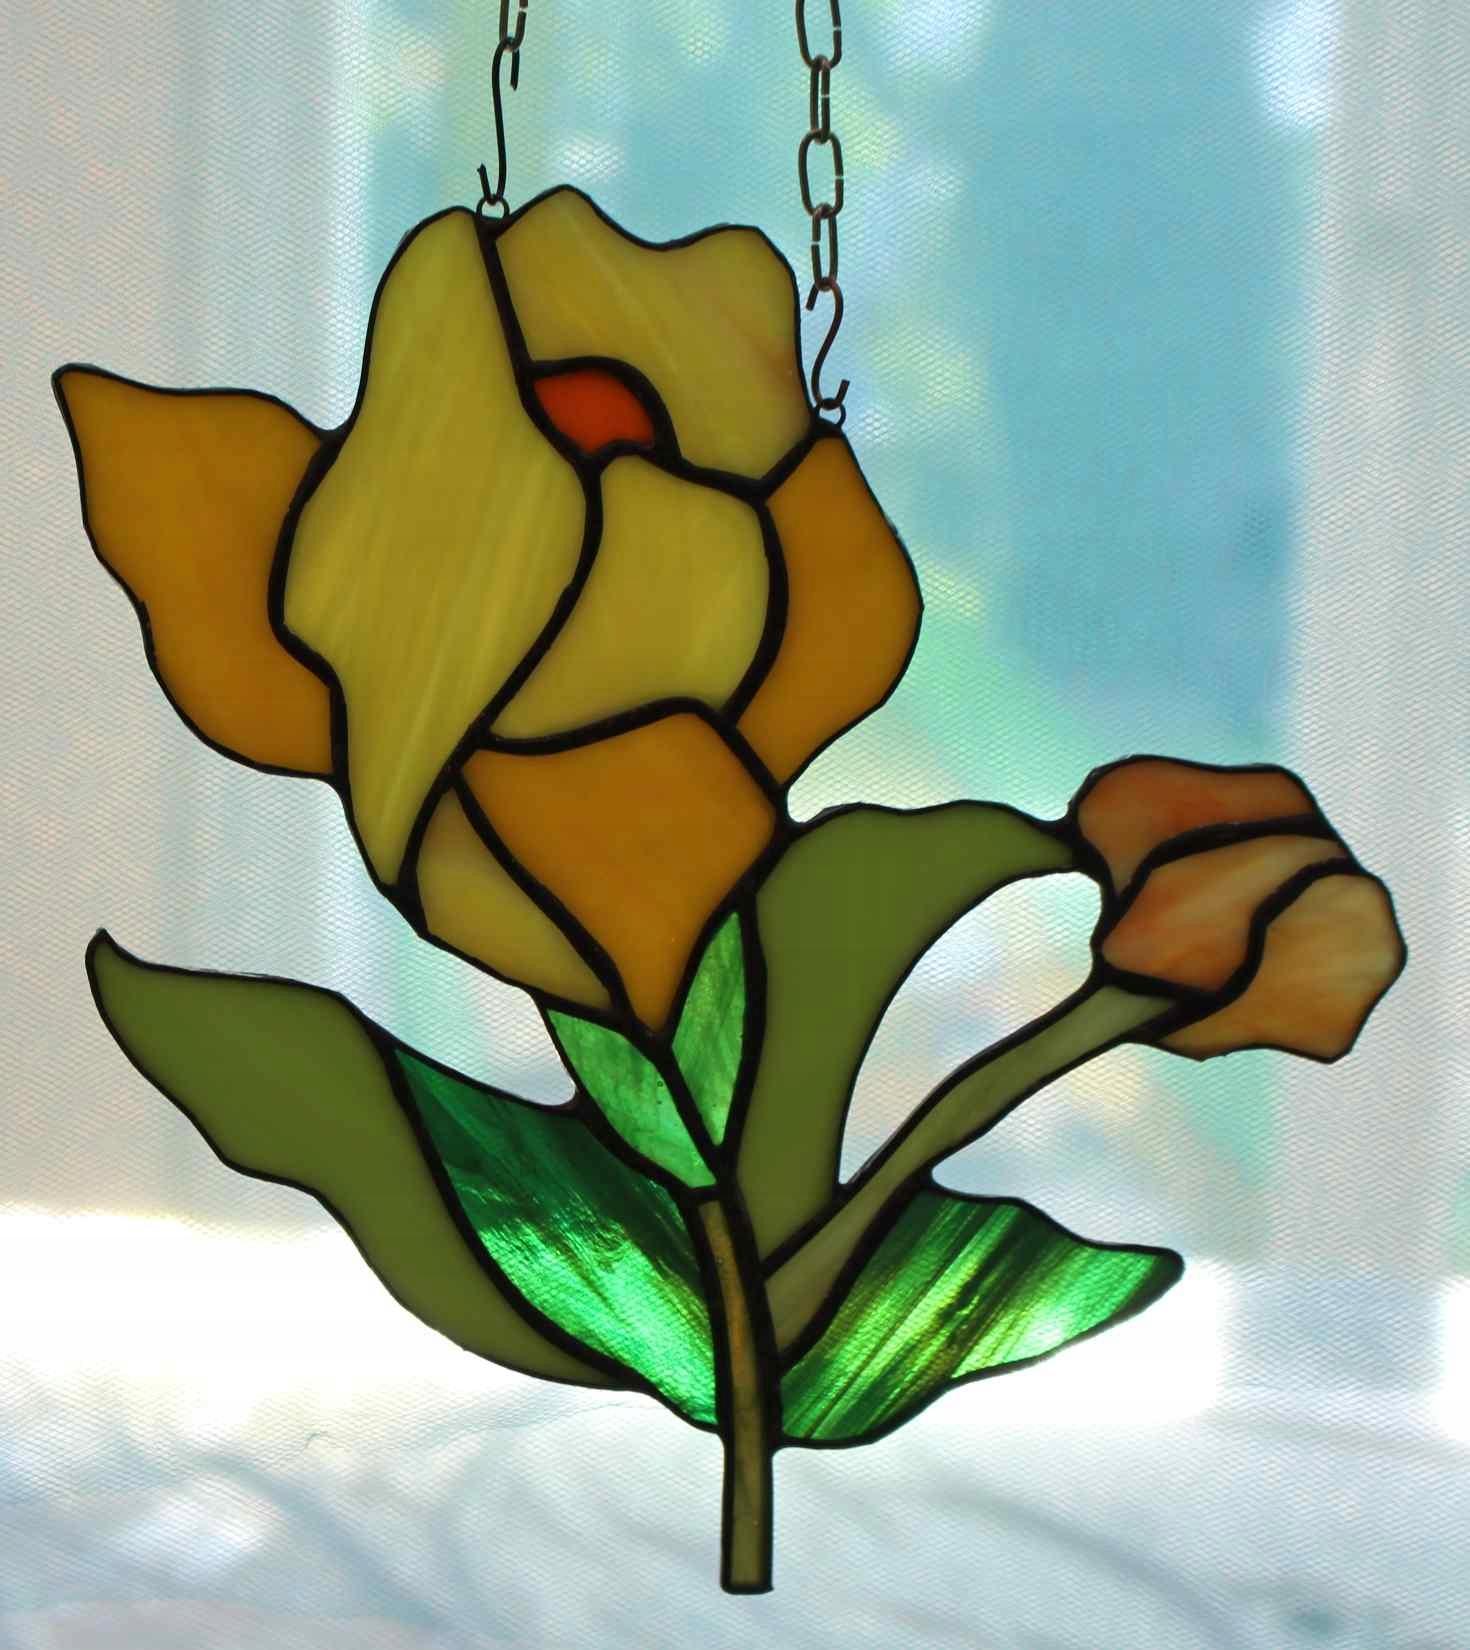 Витражный цветок с подарком ко Дню матери, бабушка желтый